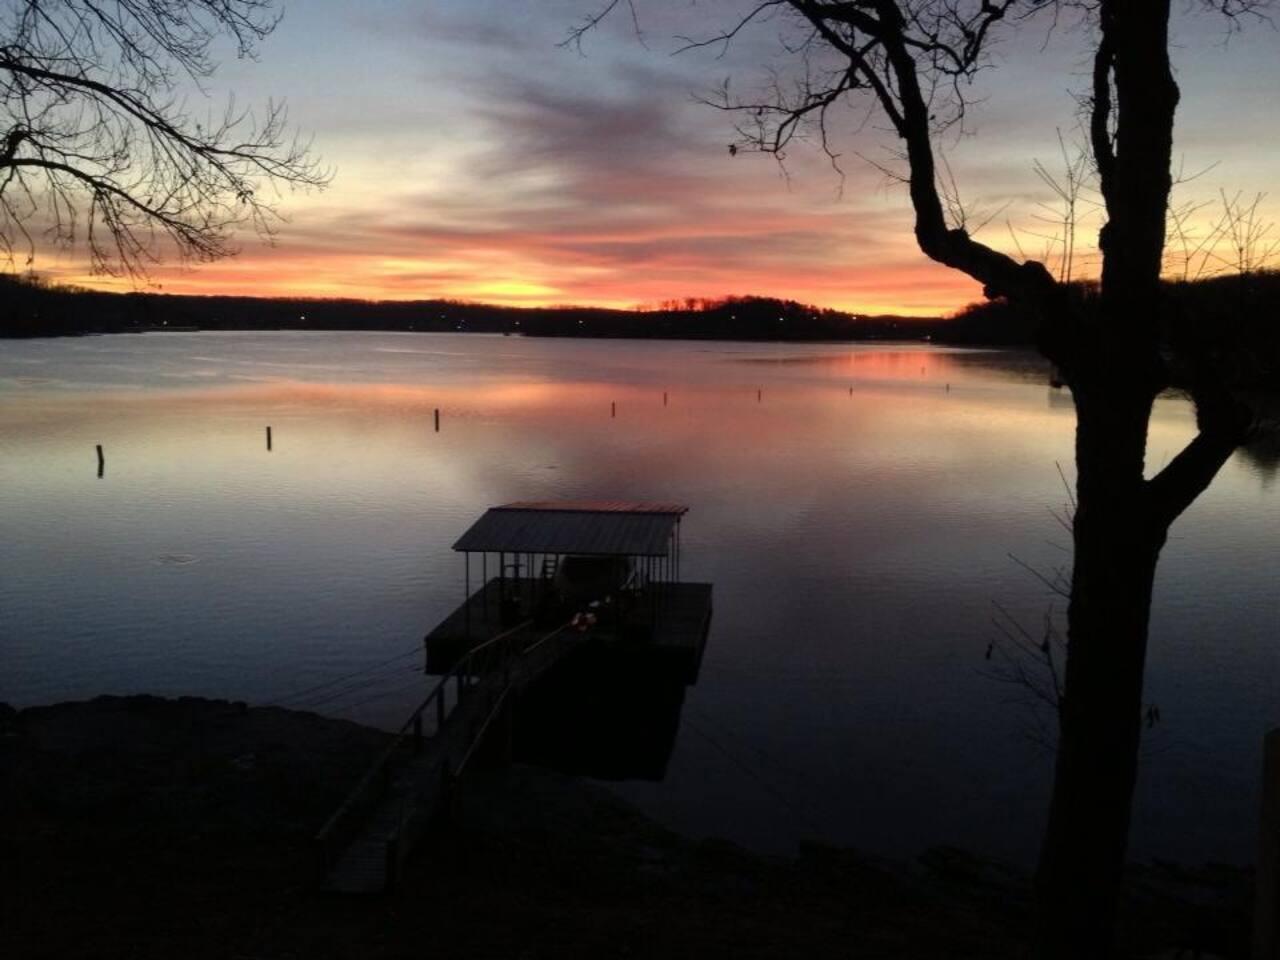 Sunrises are always amazing.